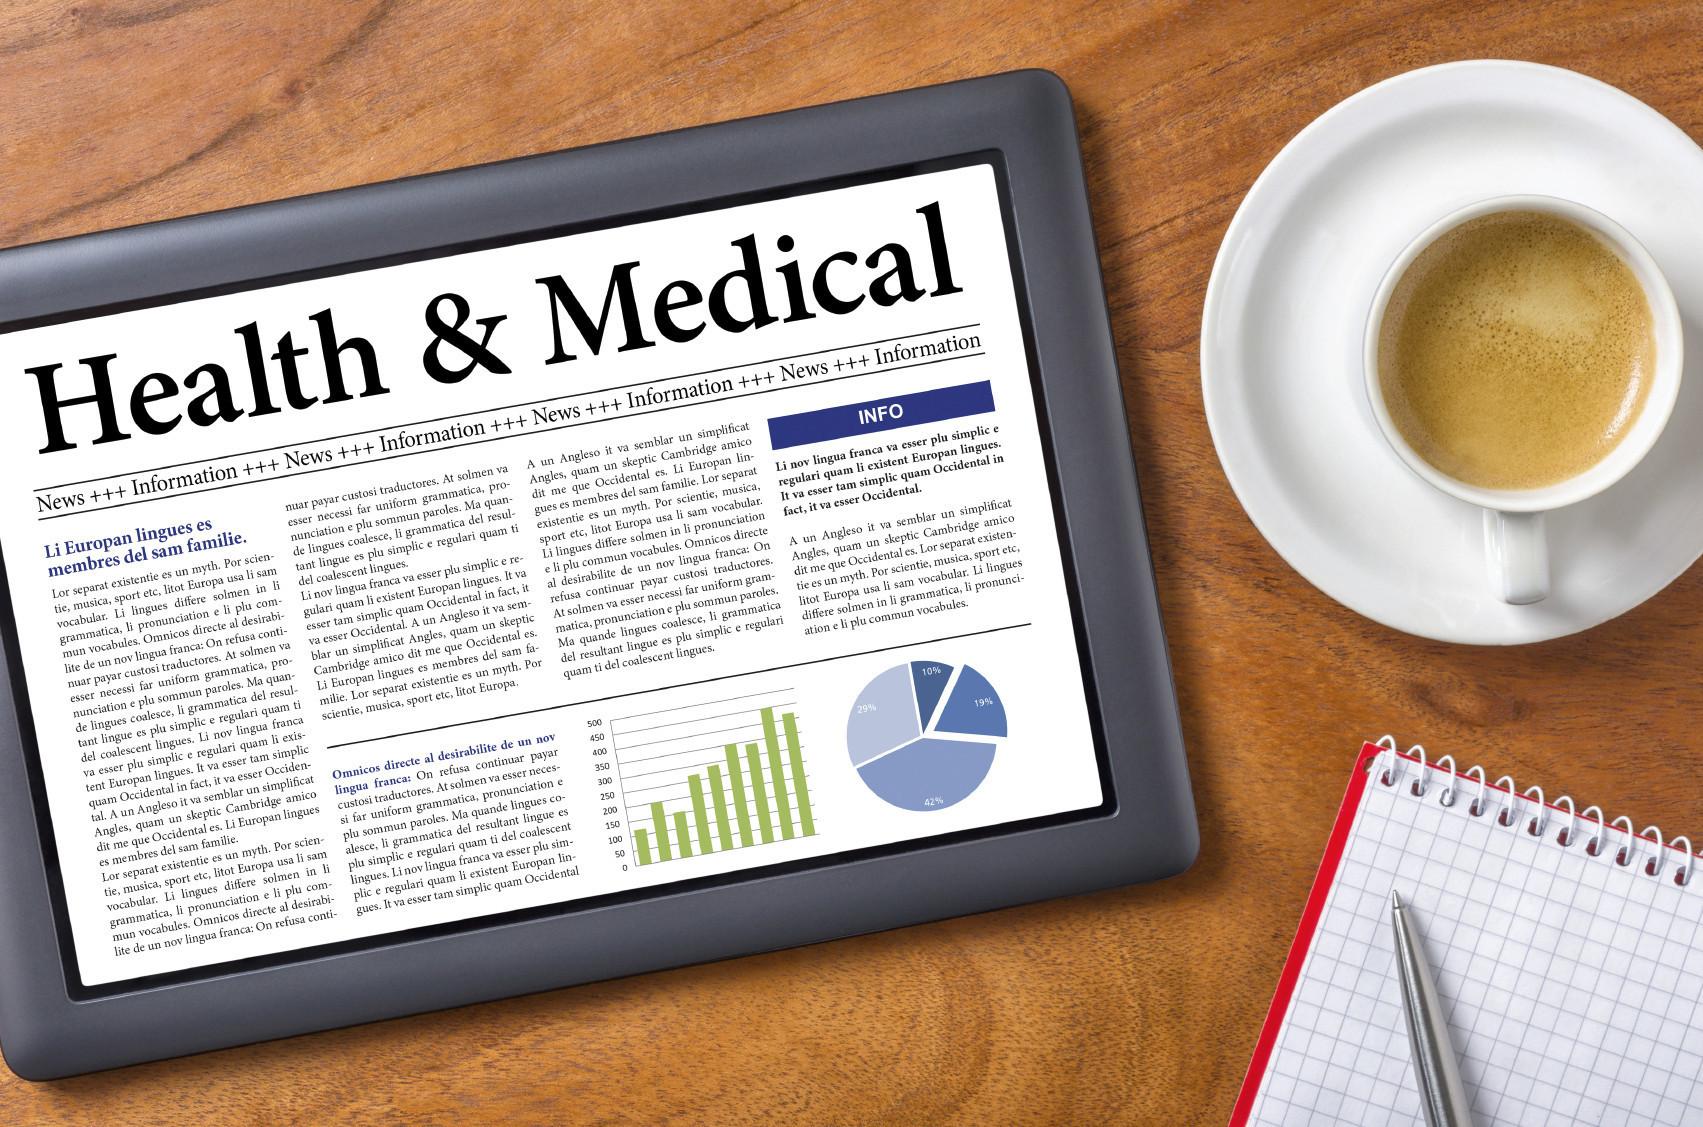 medical-news-blog-04-22-16